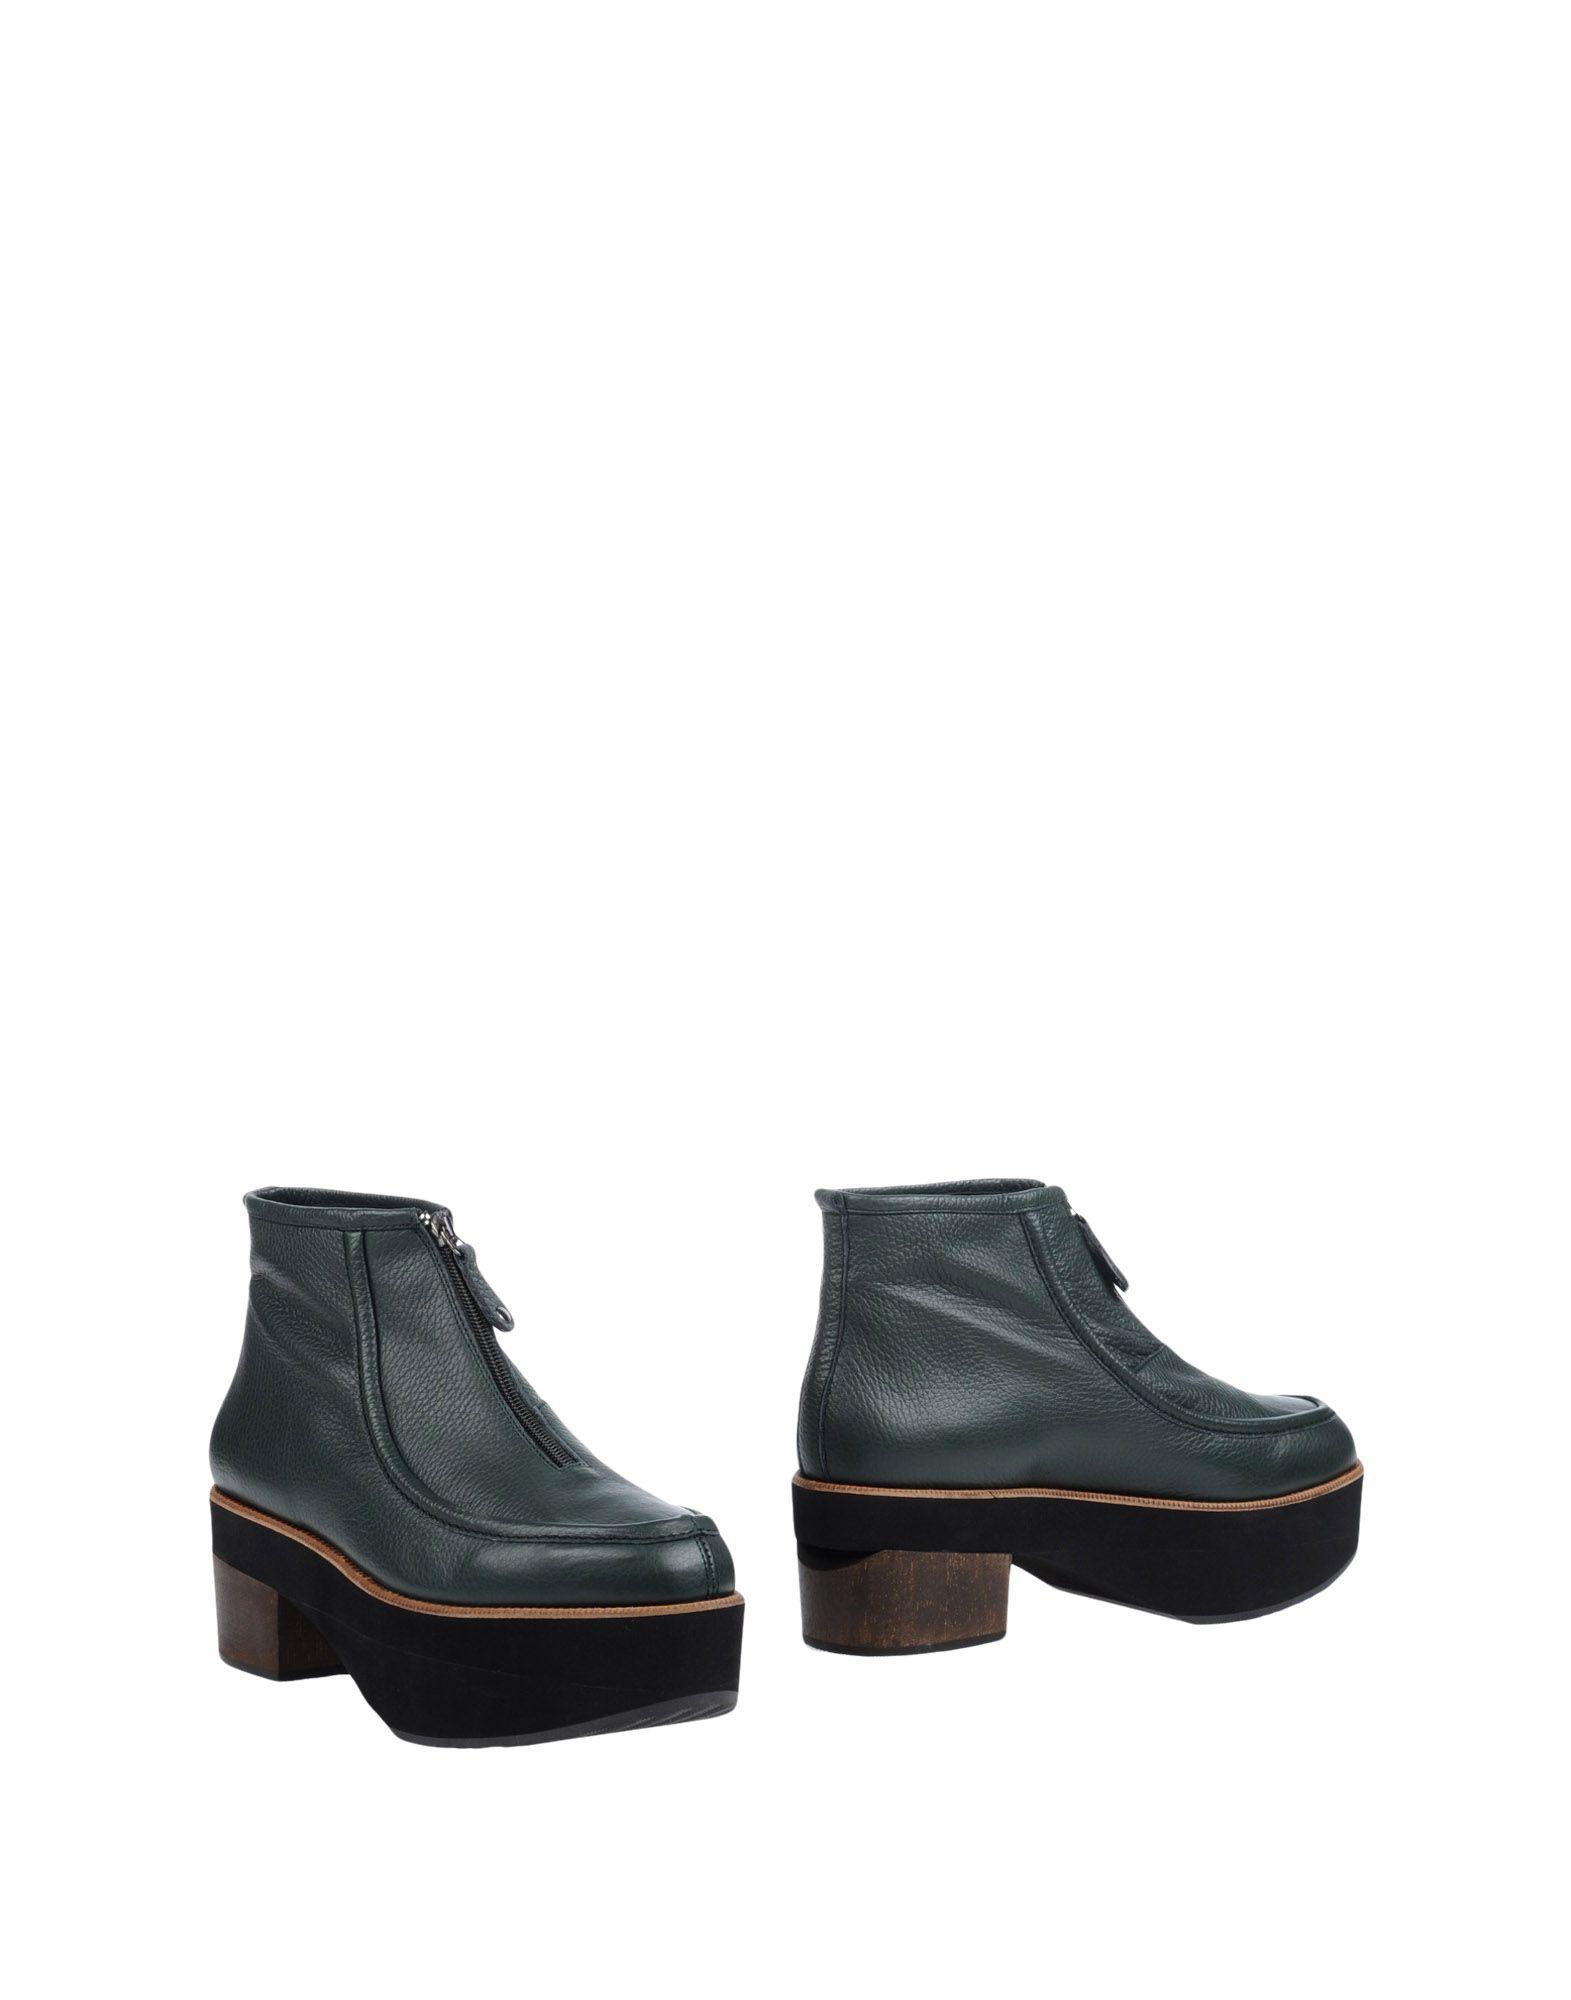 Stilvolle billige Stiefelette Schuhe Paloma Barceló Stiefelette billige Damen  11272053KB bb9f5f